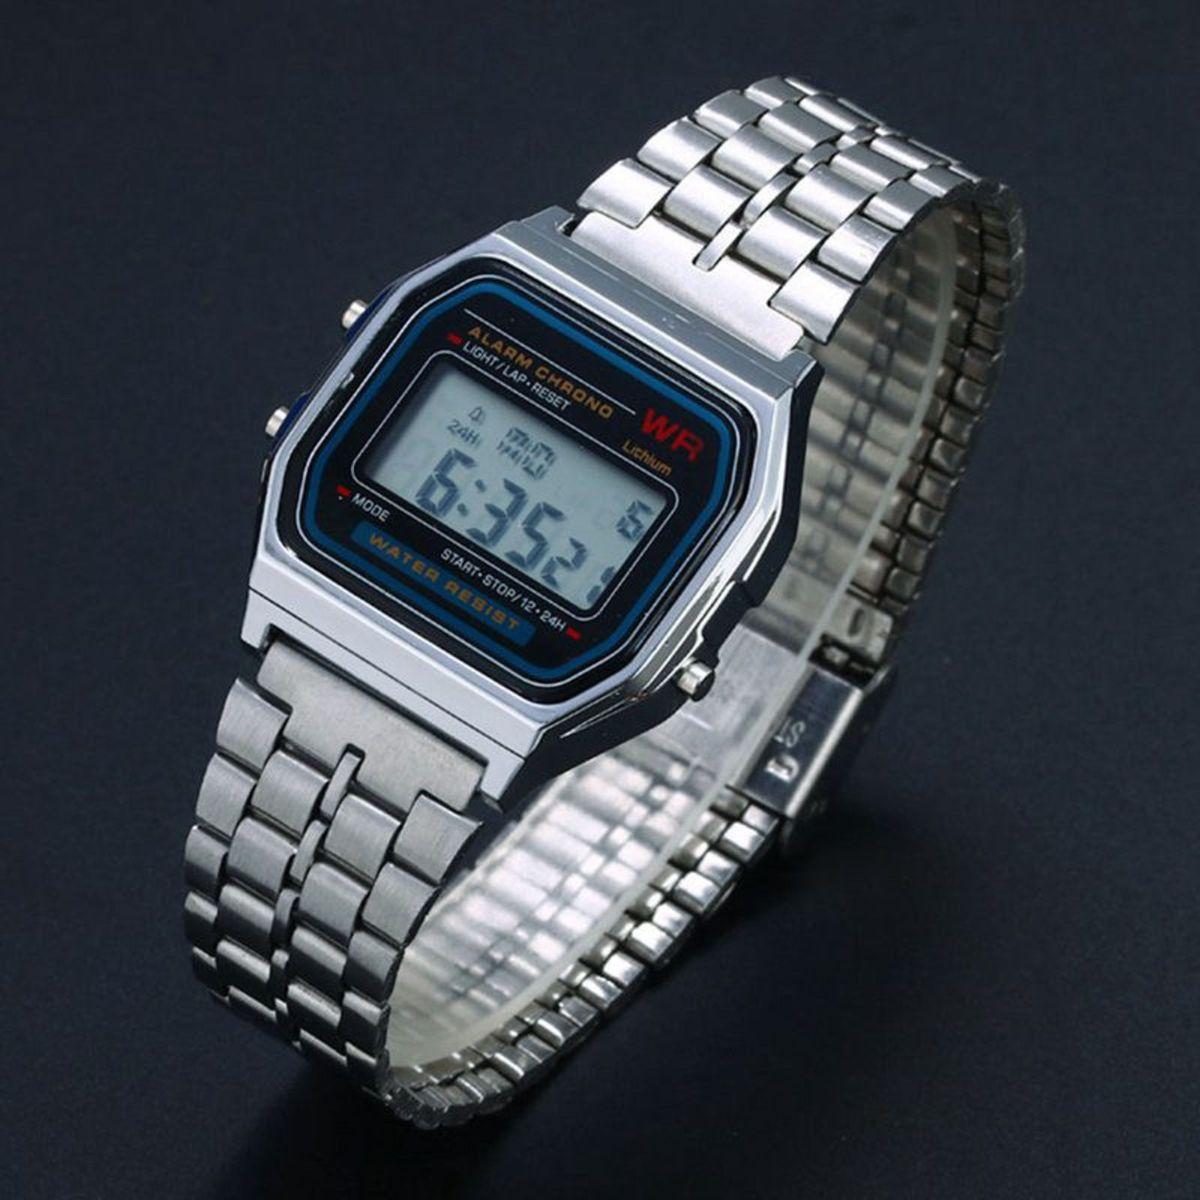 6b9872dec60 relógio estilo casio retro prata - relógios sem marca